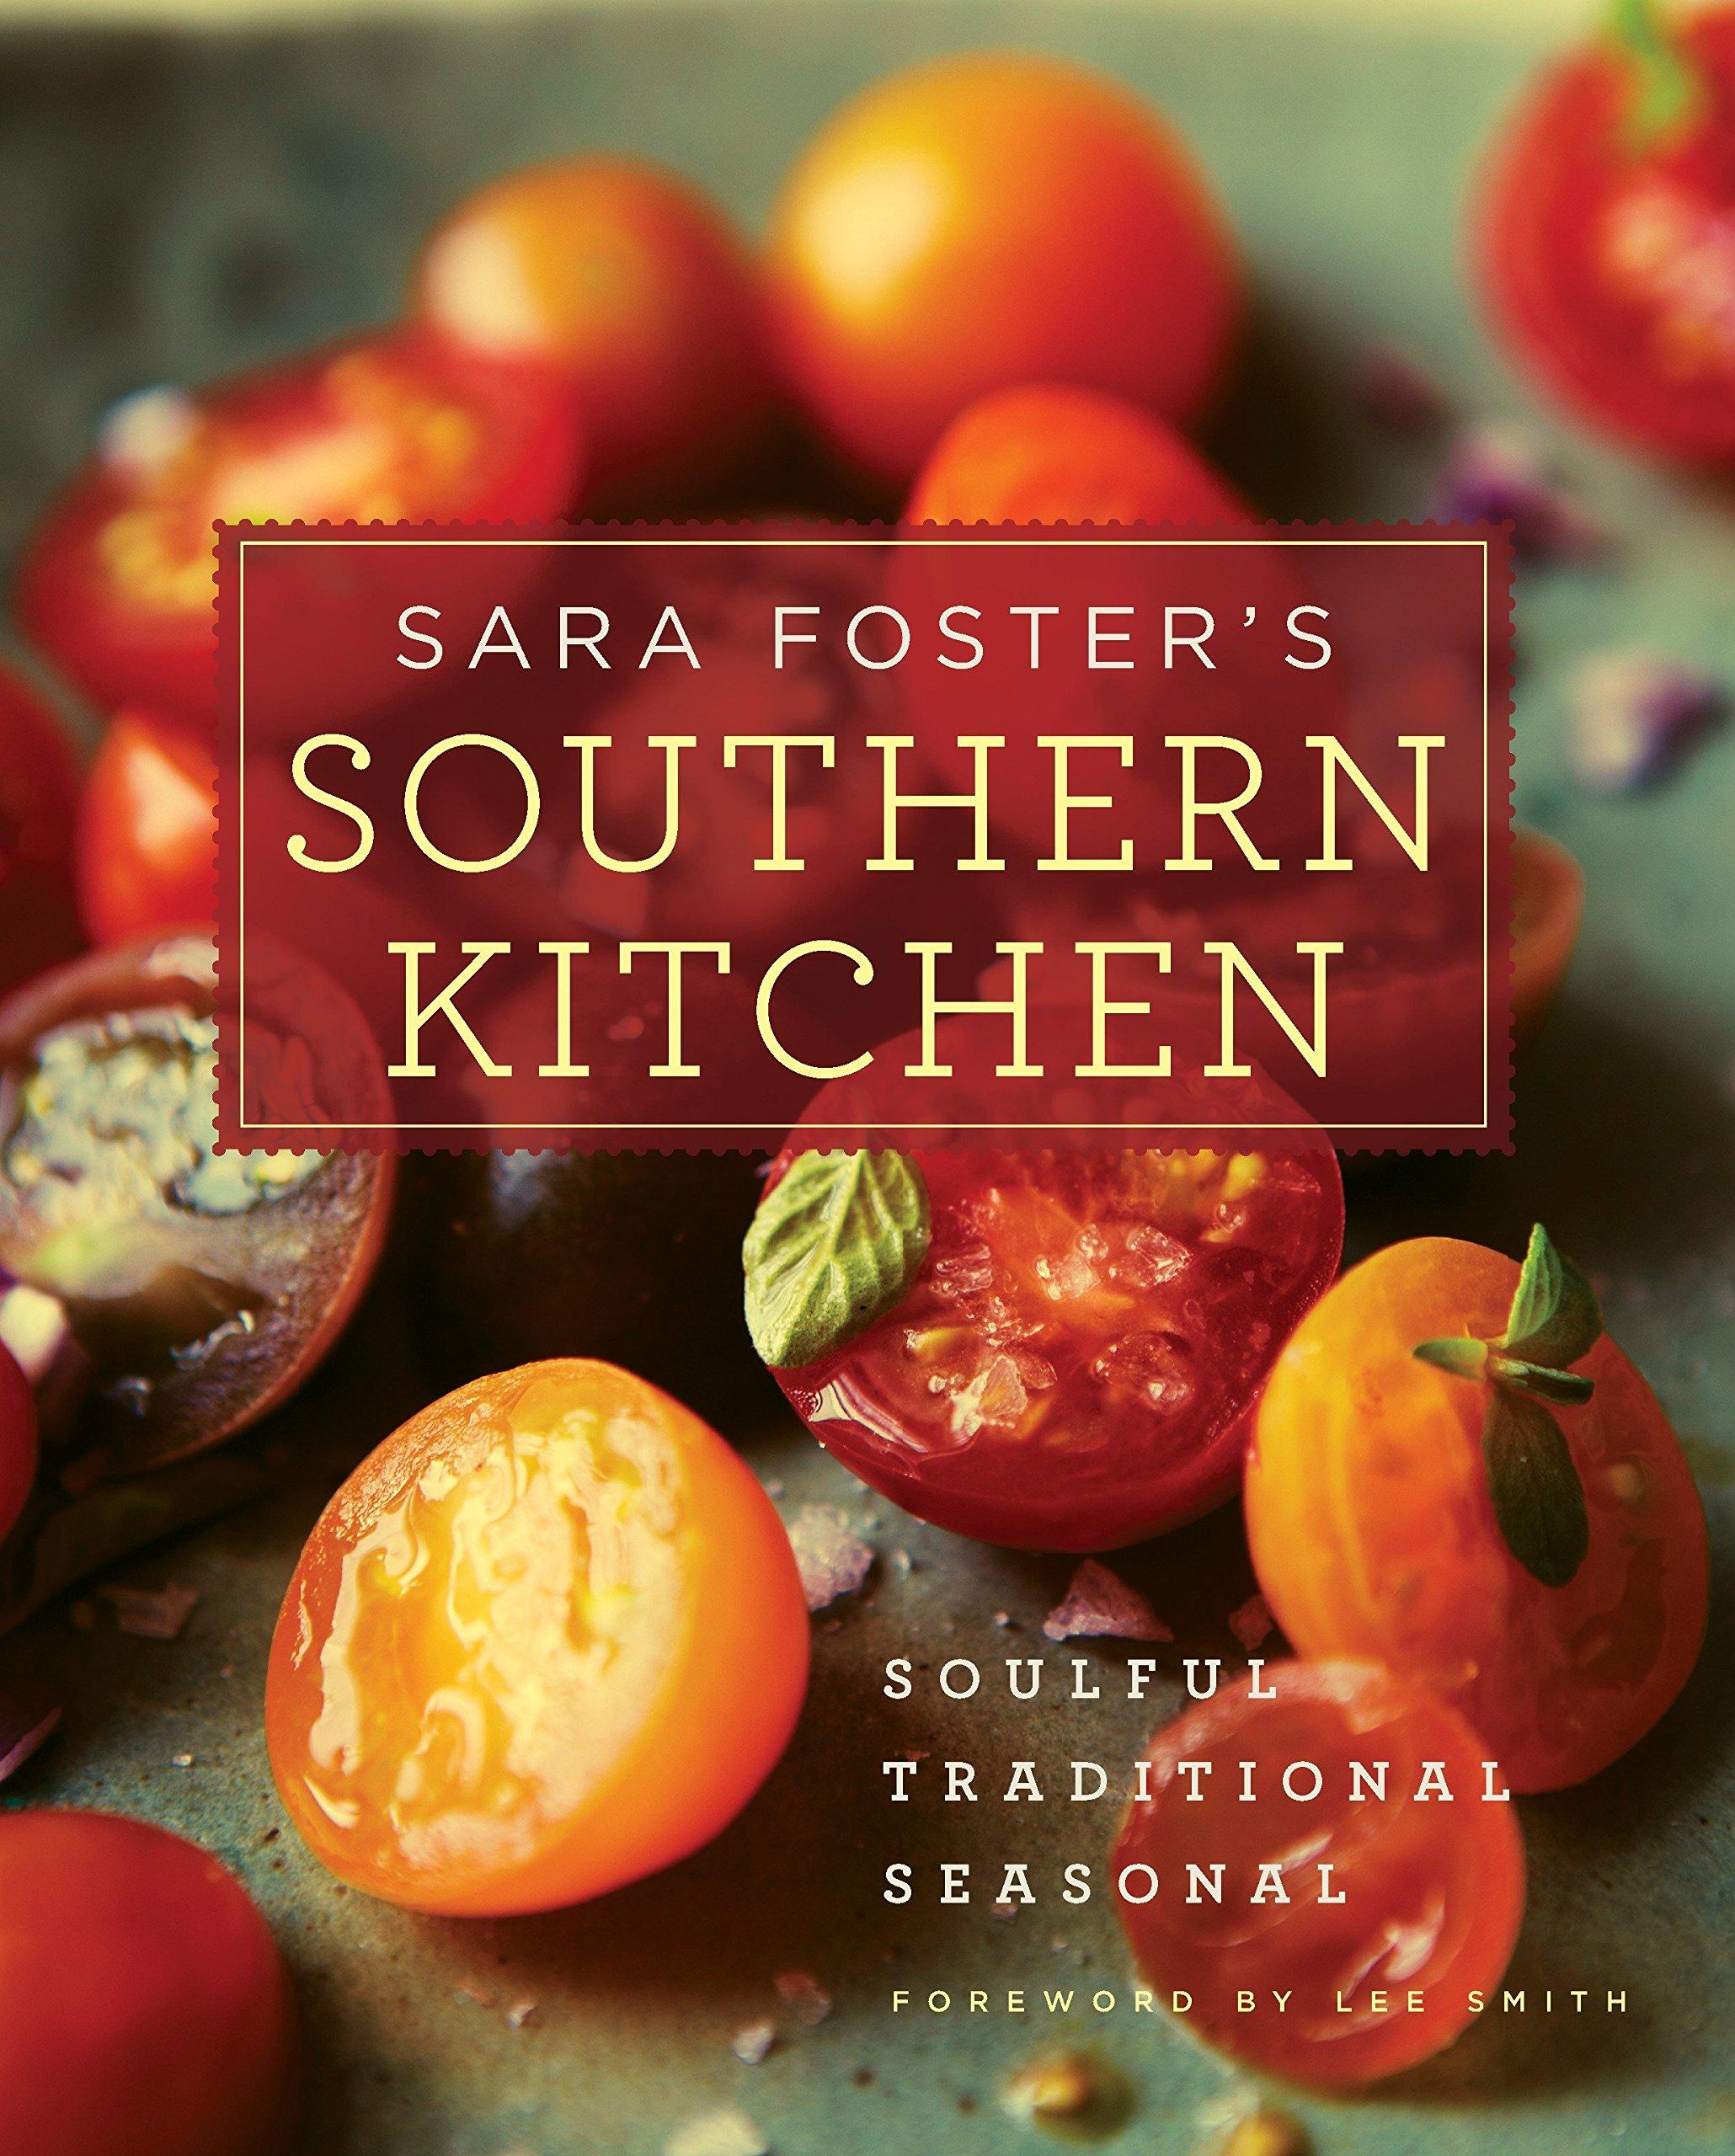 Sara Foster's Southern Kitchen: Soulful, Traditional, Seasonal pdf